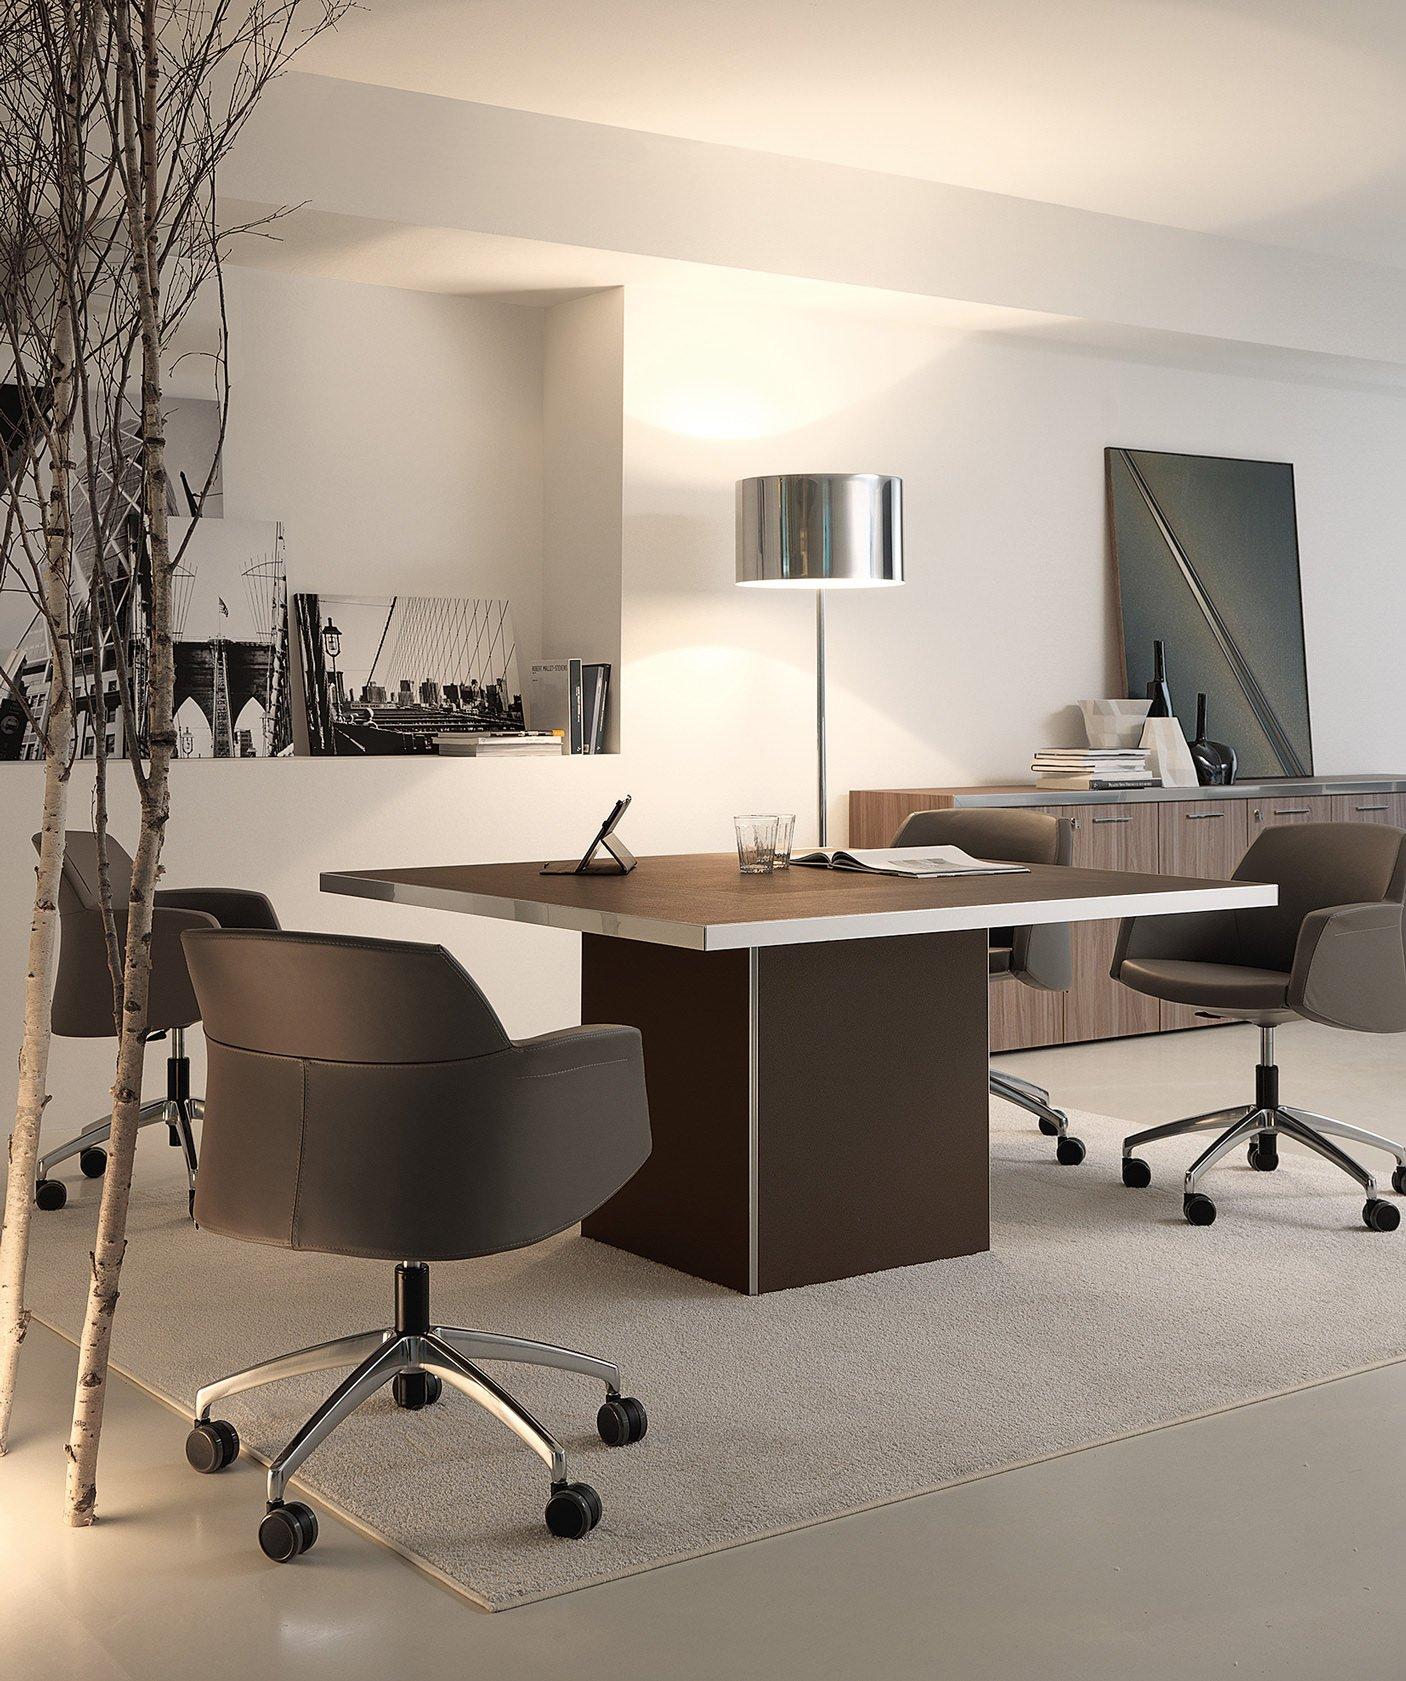 Arredo ufficio outlet elegant outlet arredo ufficio with for Outlet arredamento bergamo